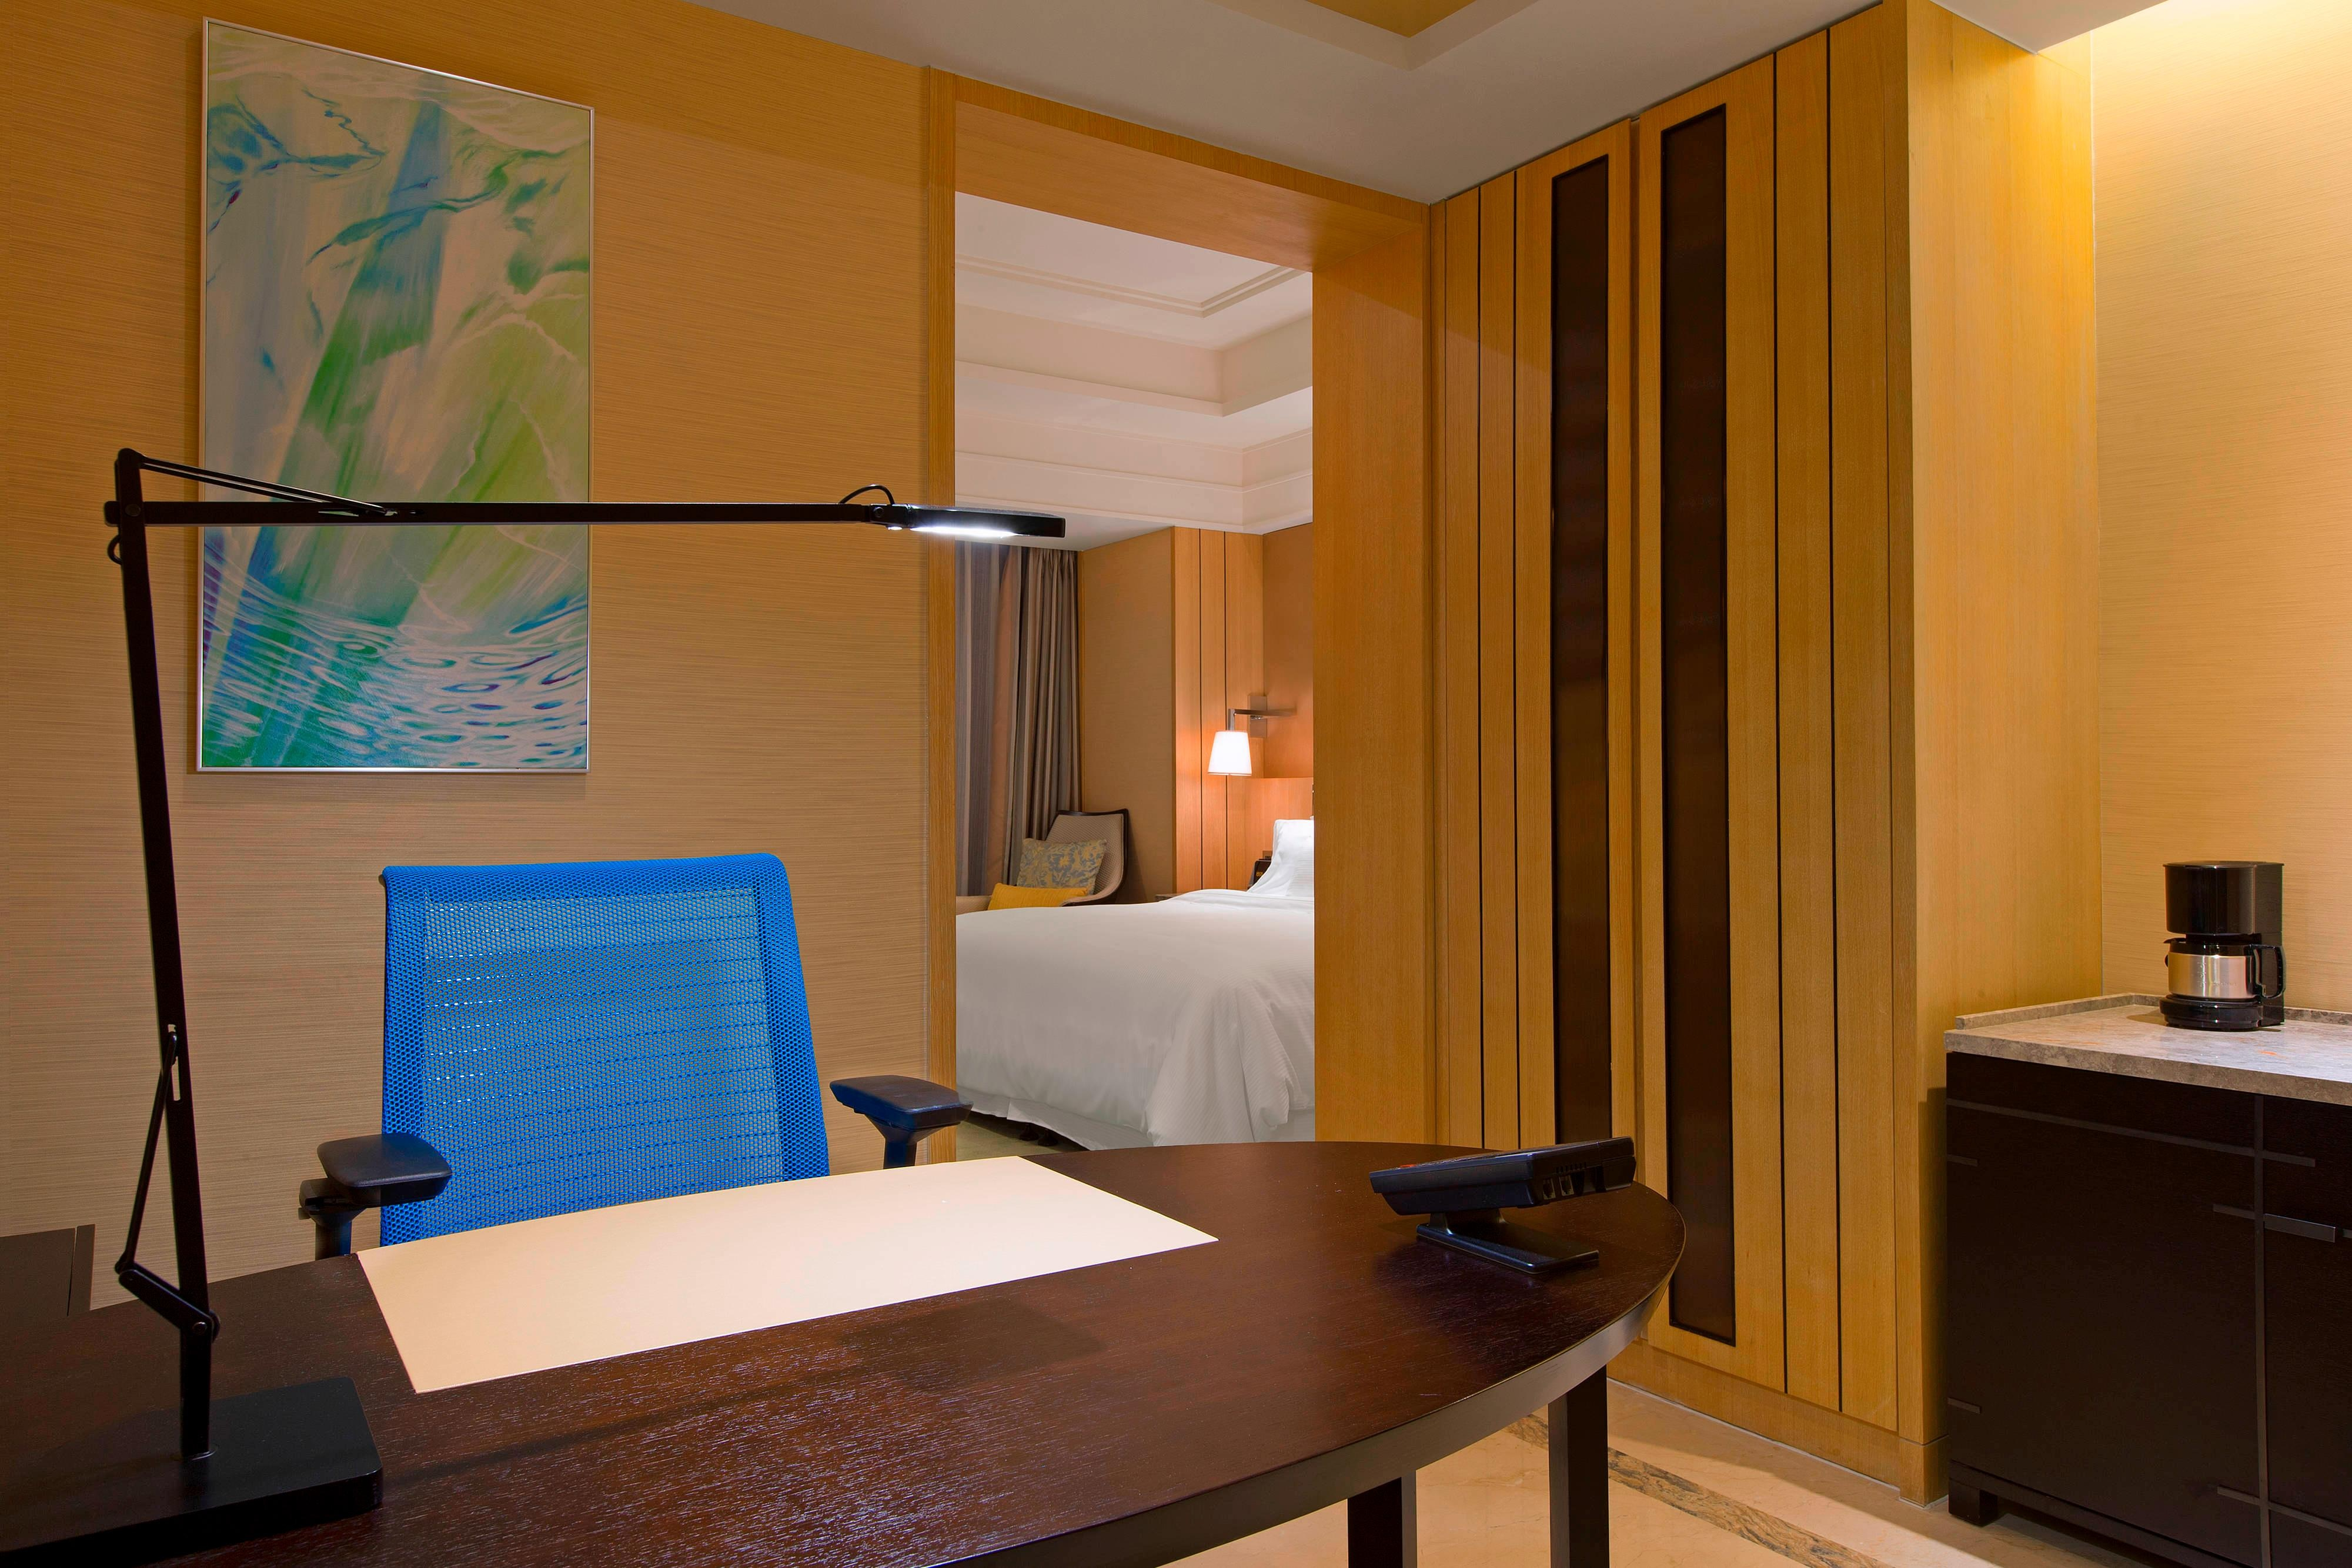 Chambre Westin Deluxe avec lit king size